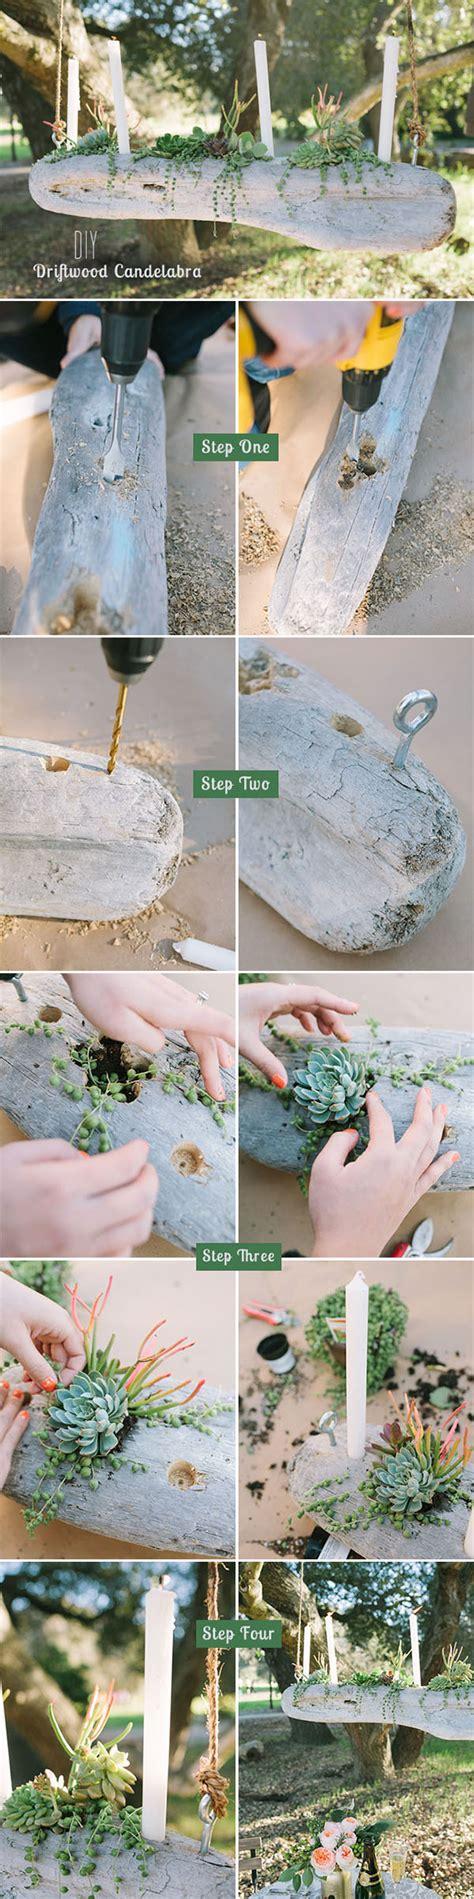 diy rustic wedding ideas top 10 diy projects for rustic wedding ideas